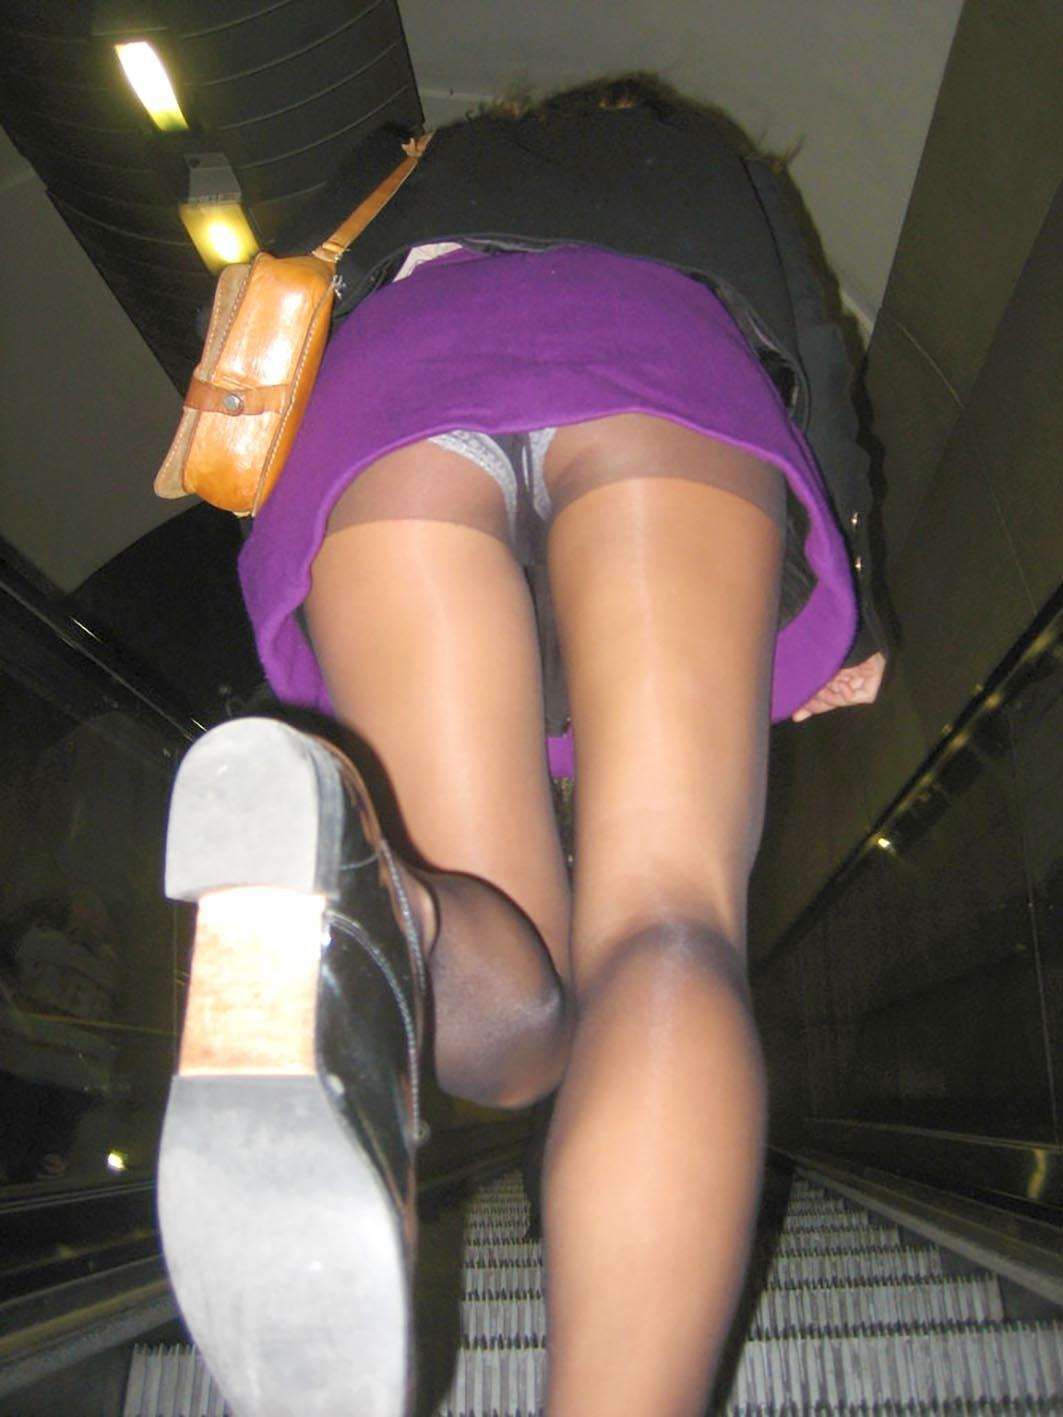 Фото под юбкаи в метро 6 фотография